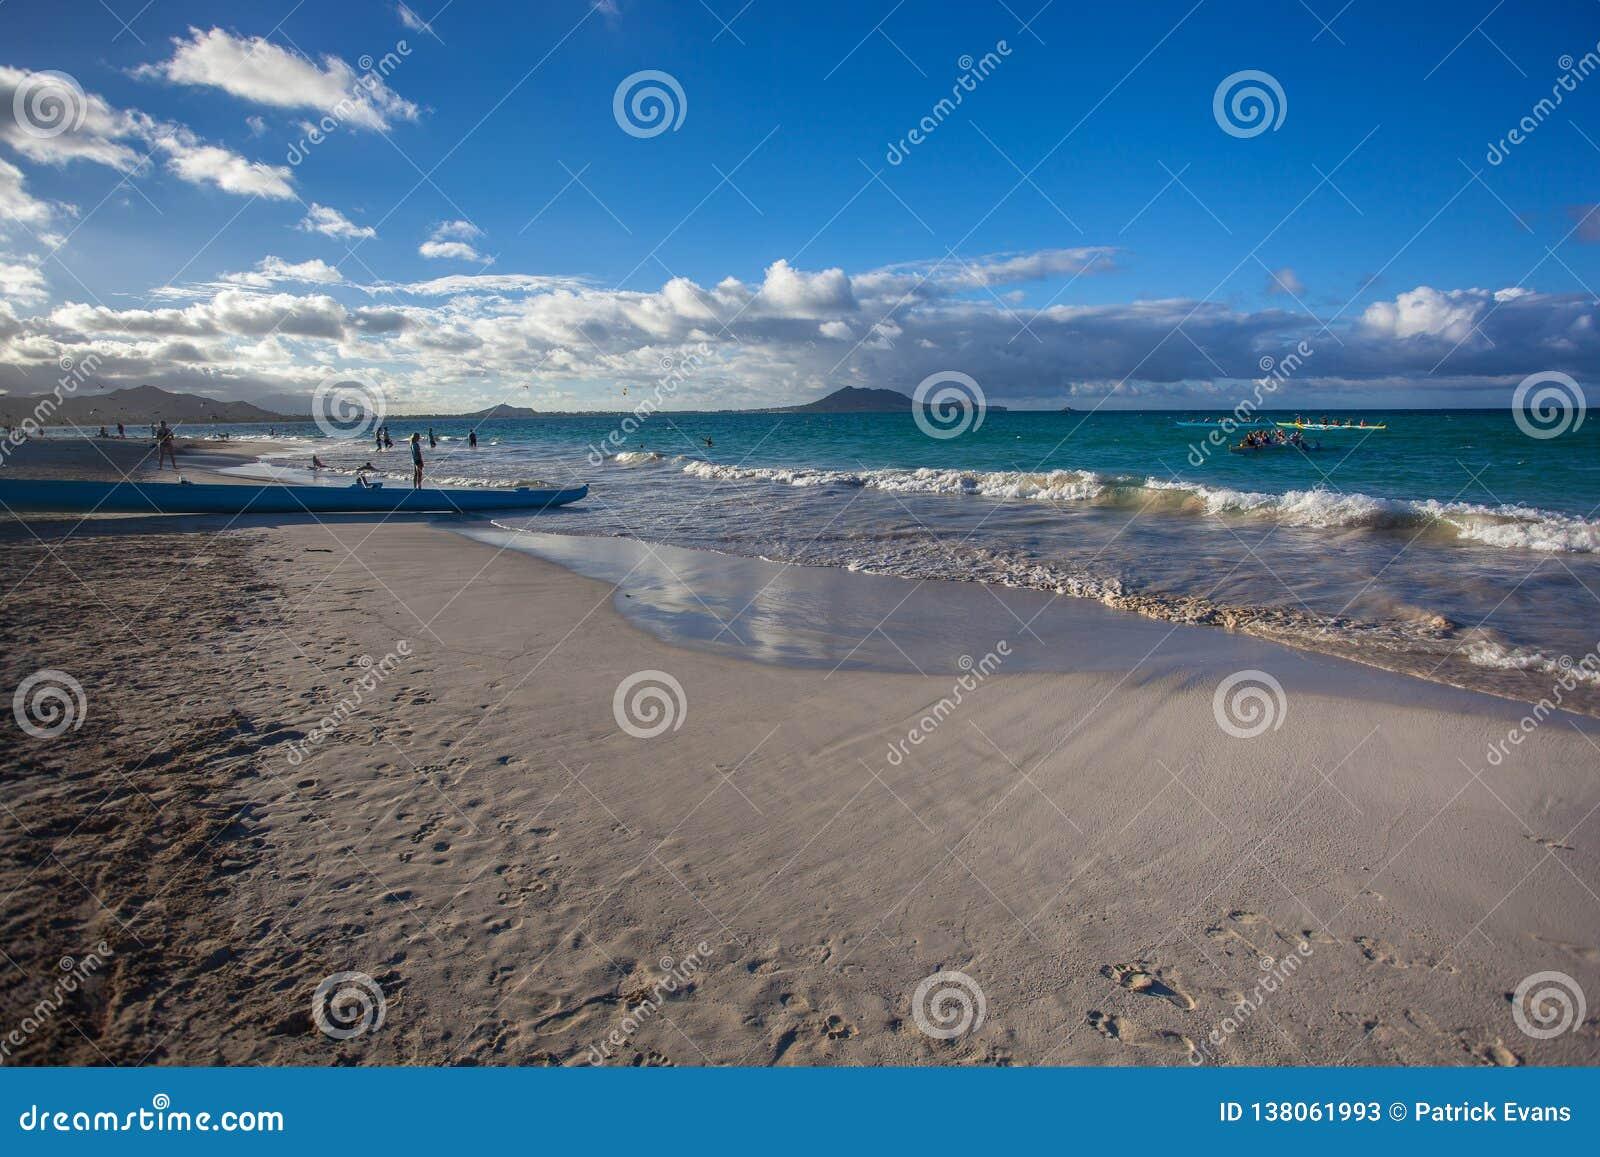 Amazing Kailua Beach Park Oahu Hawaii Stock Image Image Of